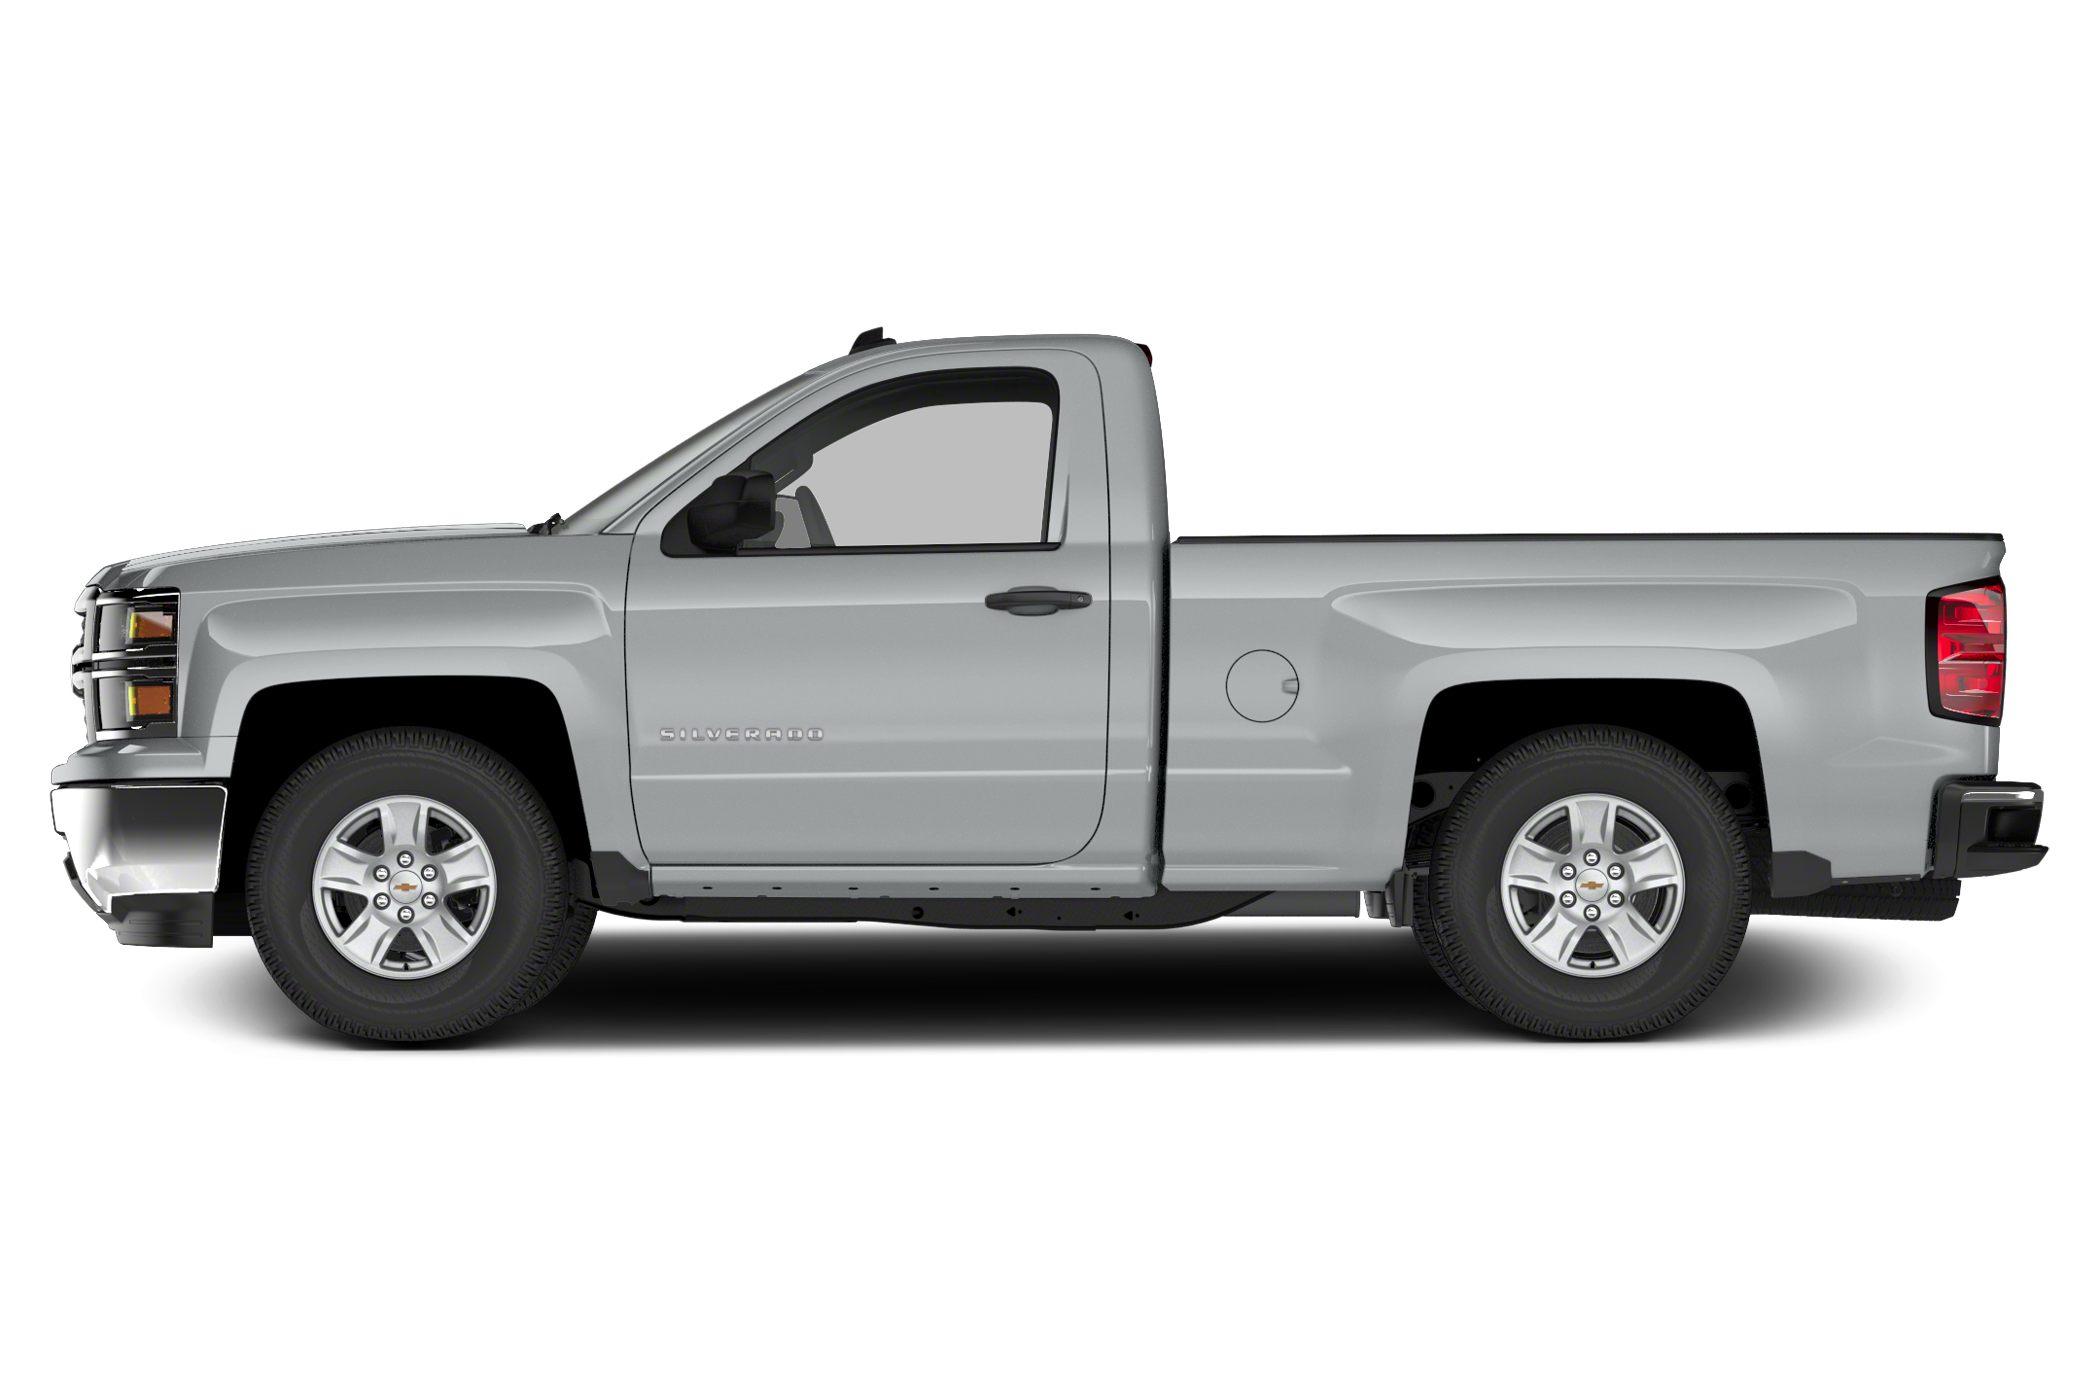 release reviews trucks silverado chevrolet hd cars performance